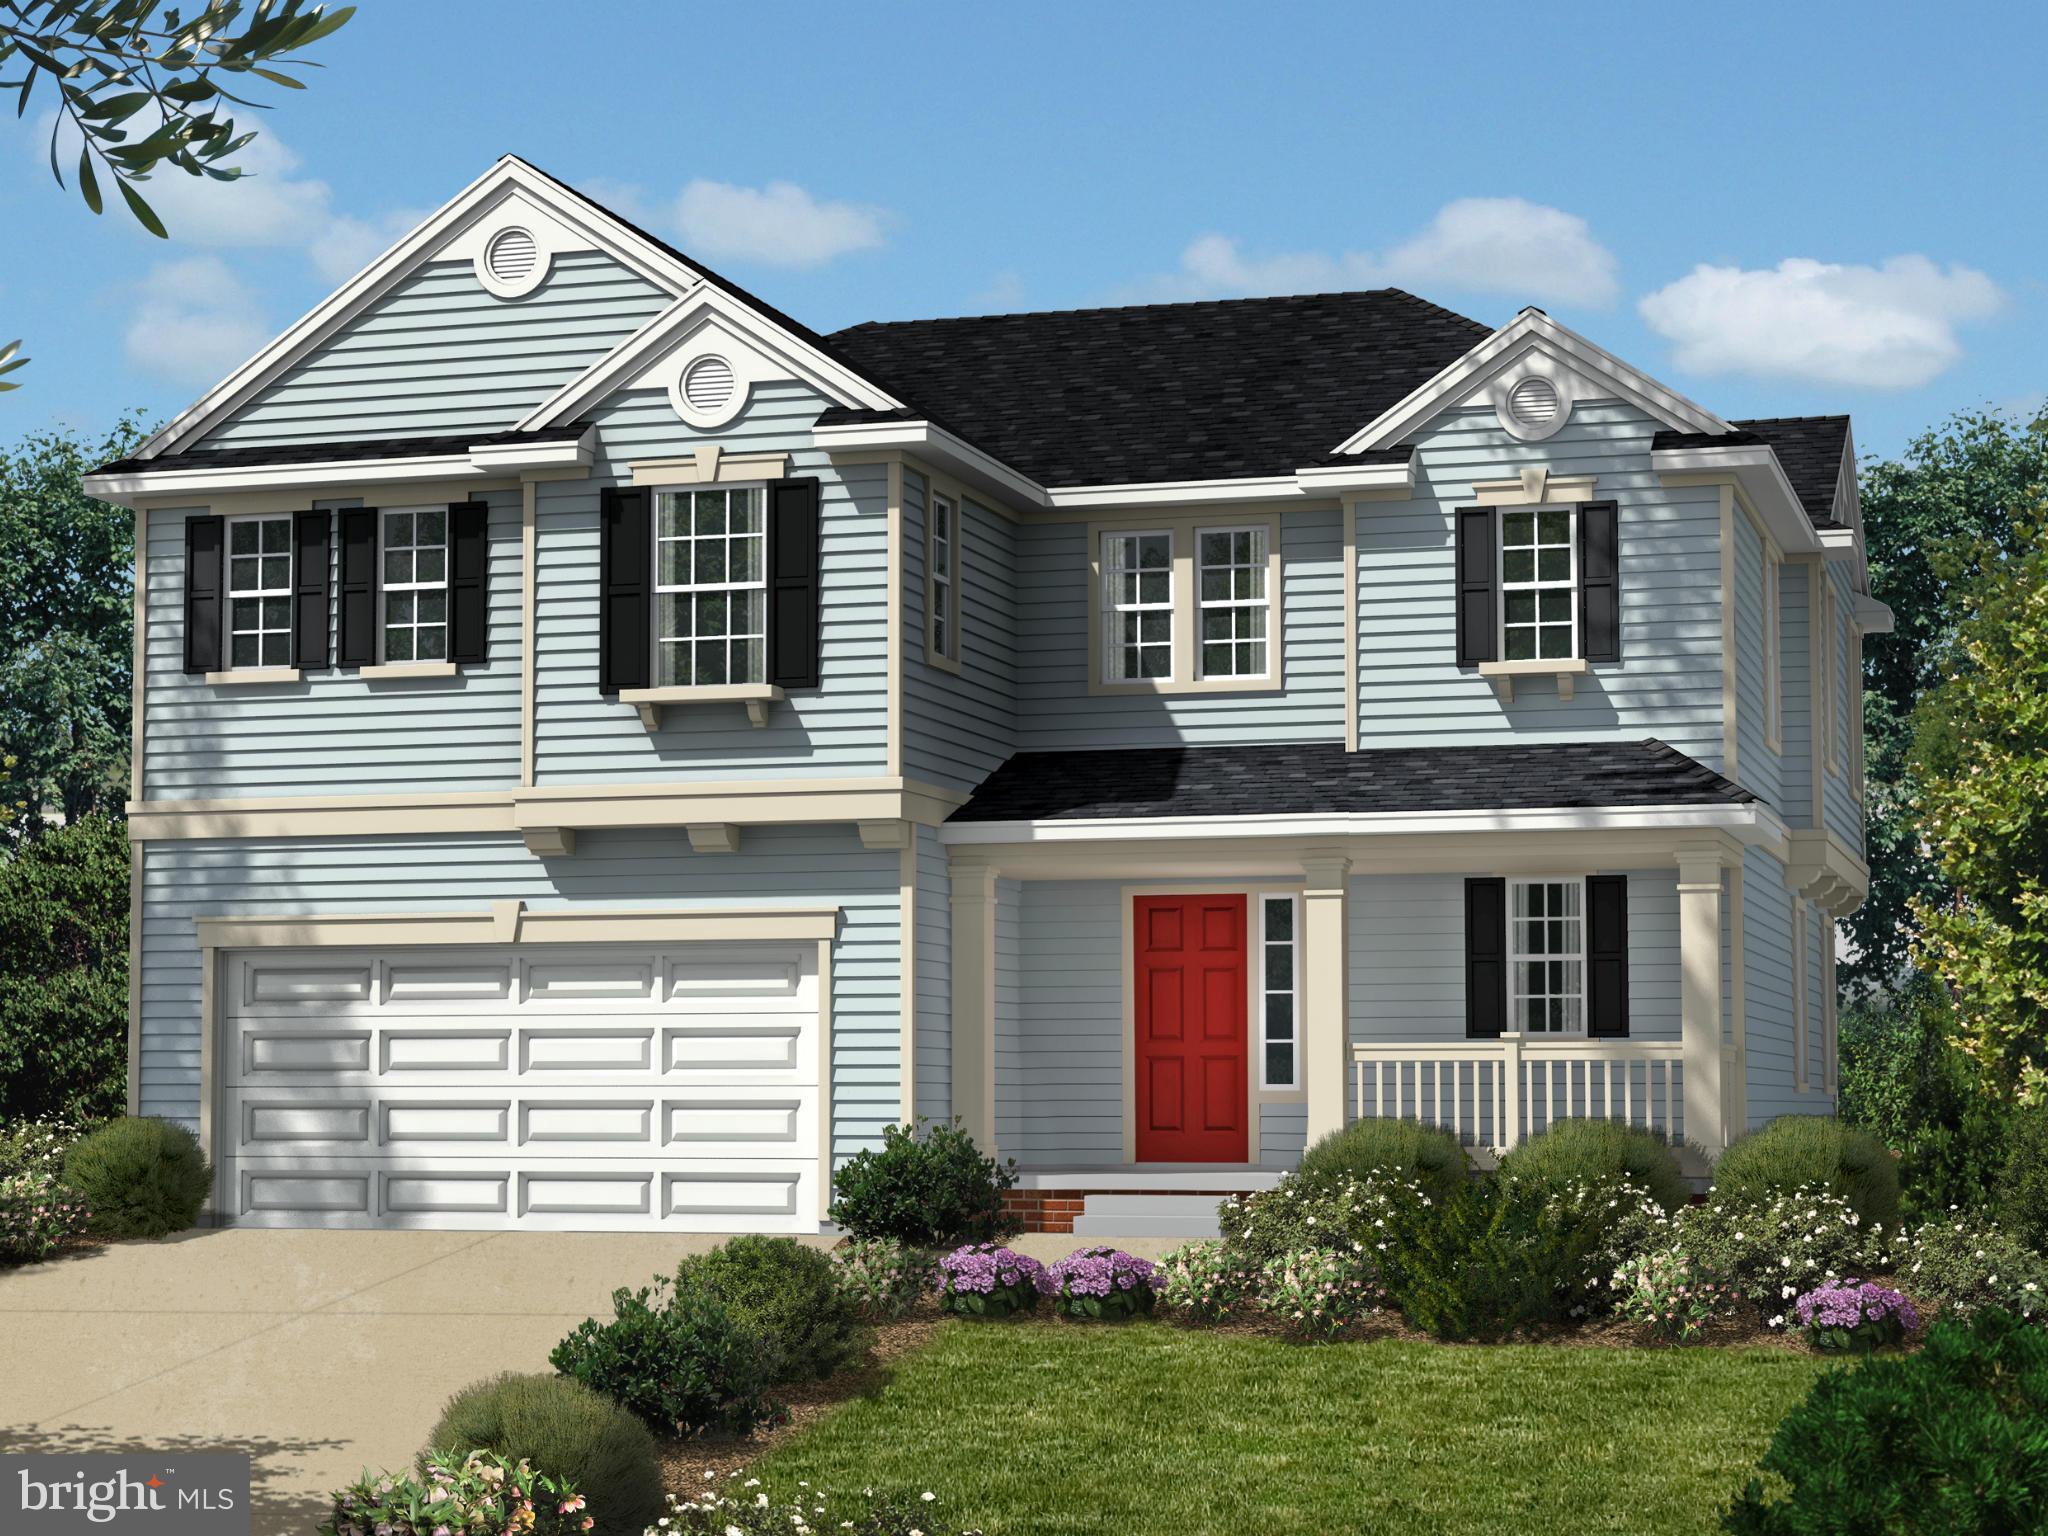 Kb Home Warranty Claim Form Flisol Home